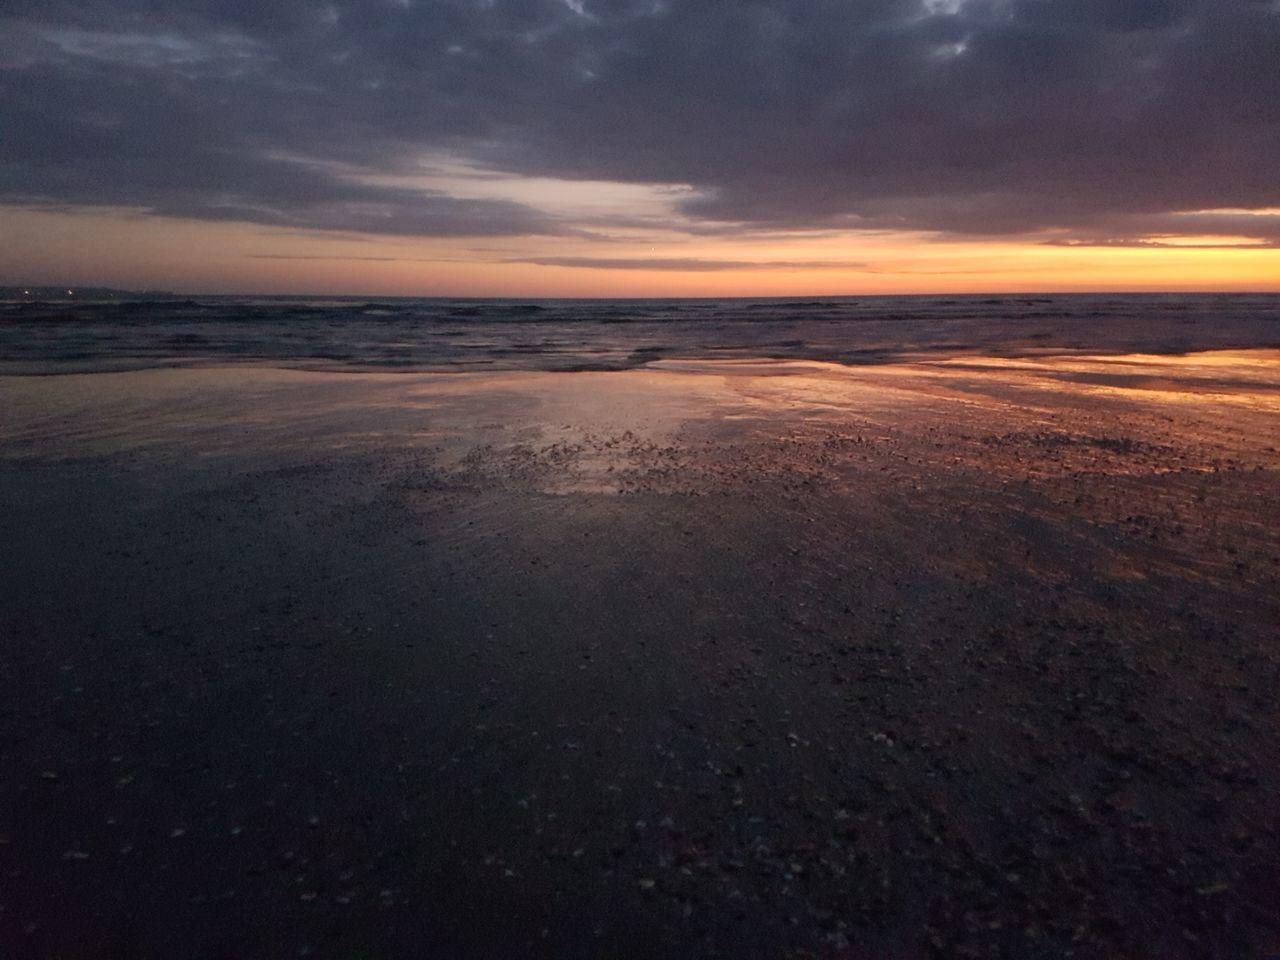 Beach Sea Sunset Horizon Over Water Dramatic Sky Beauty In Nature Landscape Summer Sky EyeEm Indonesia EyeEm Best Shots Eye Em Nature Lover Eye For Photography EyeEmBestPics Bestoftheday EyeEmNewHere Eyeemphotography EyeEm Best Shots - Nature EyeEmGalley EyeEm Vacations Water Outdoors Tranquility Low Tide Neighborhood Map